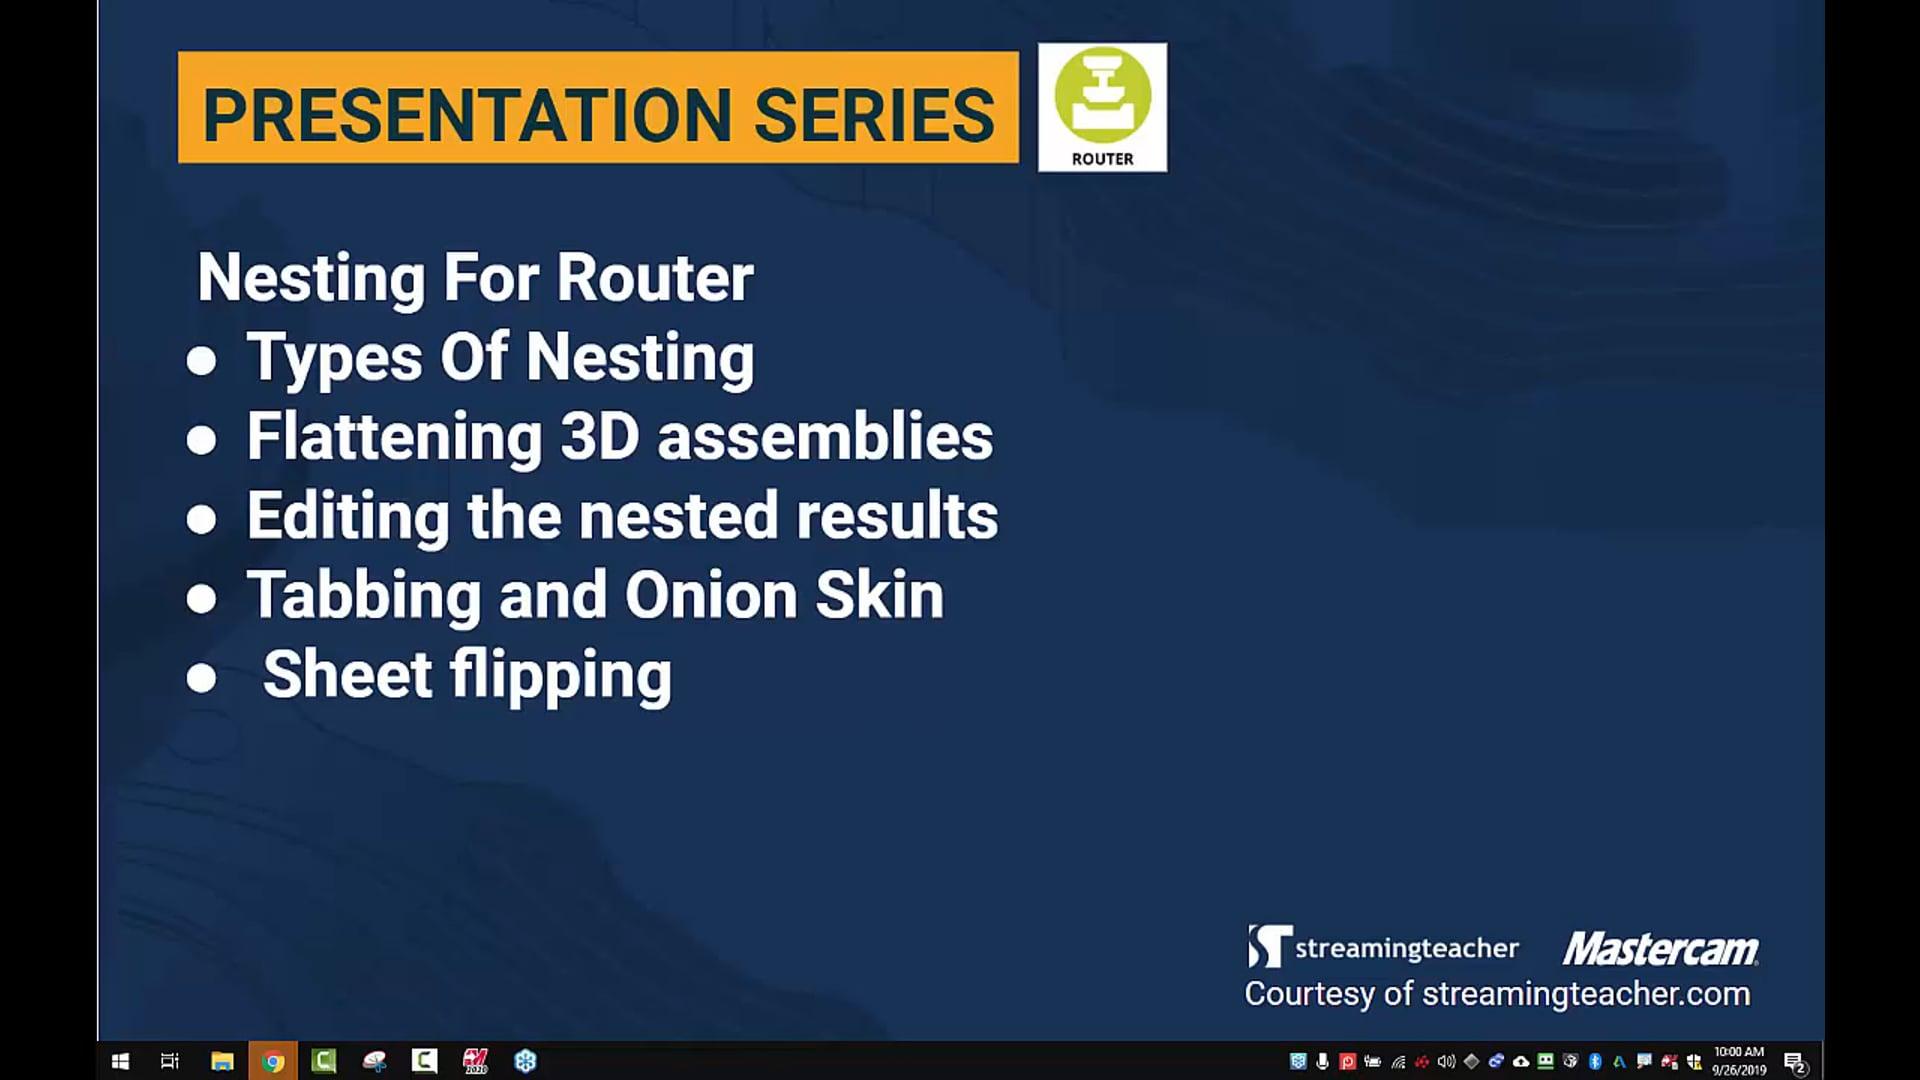 Nesting for Router